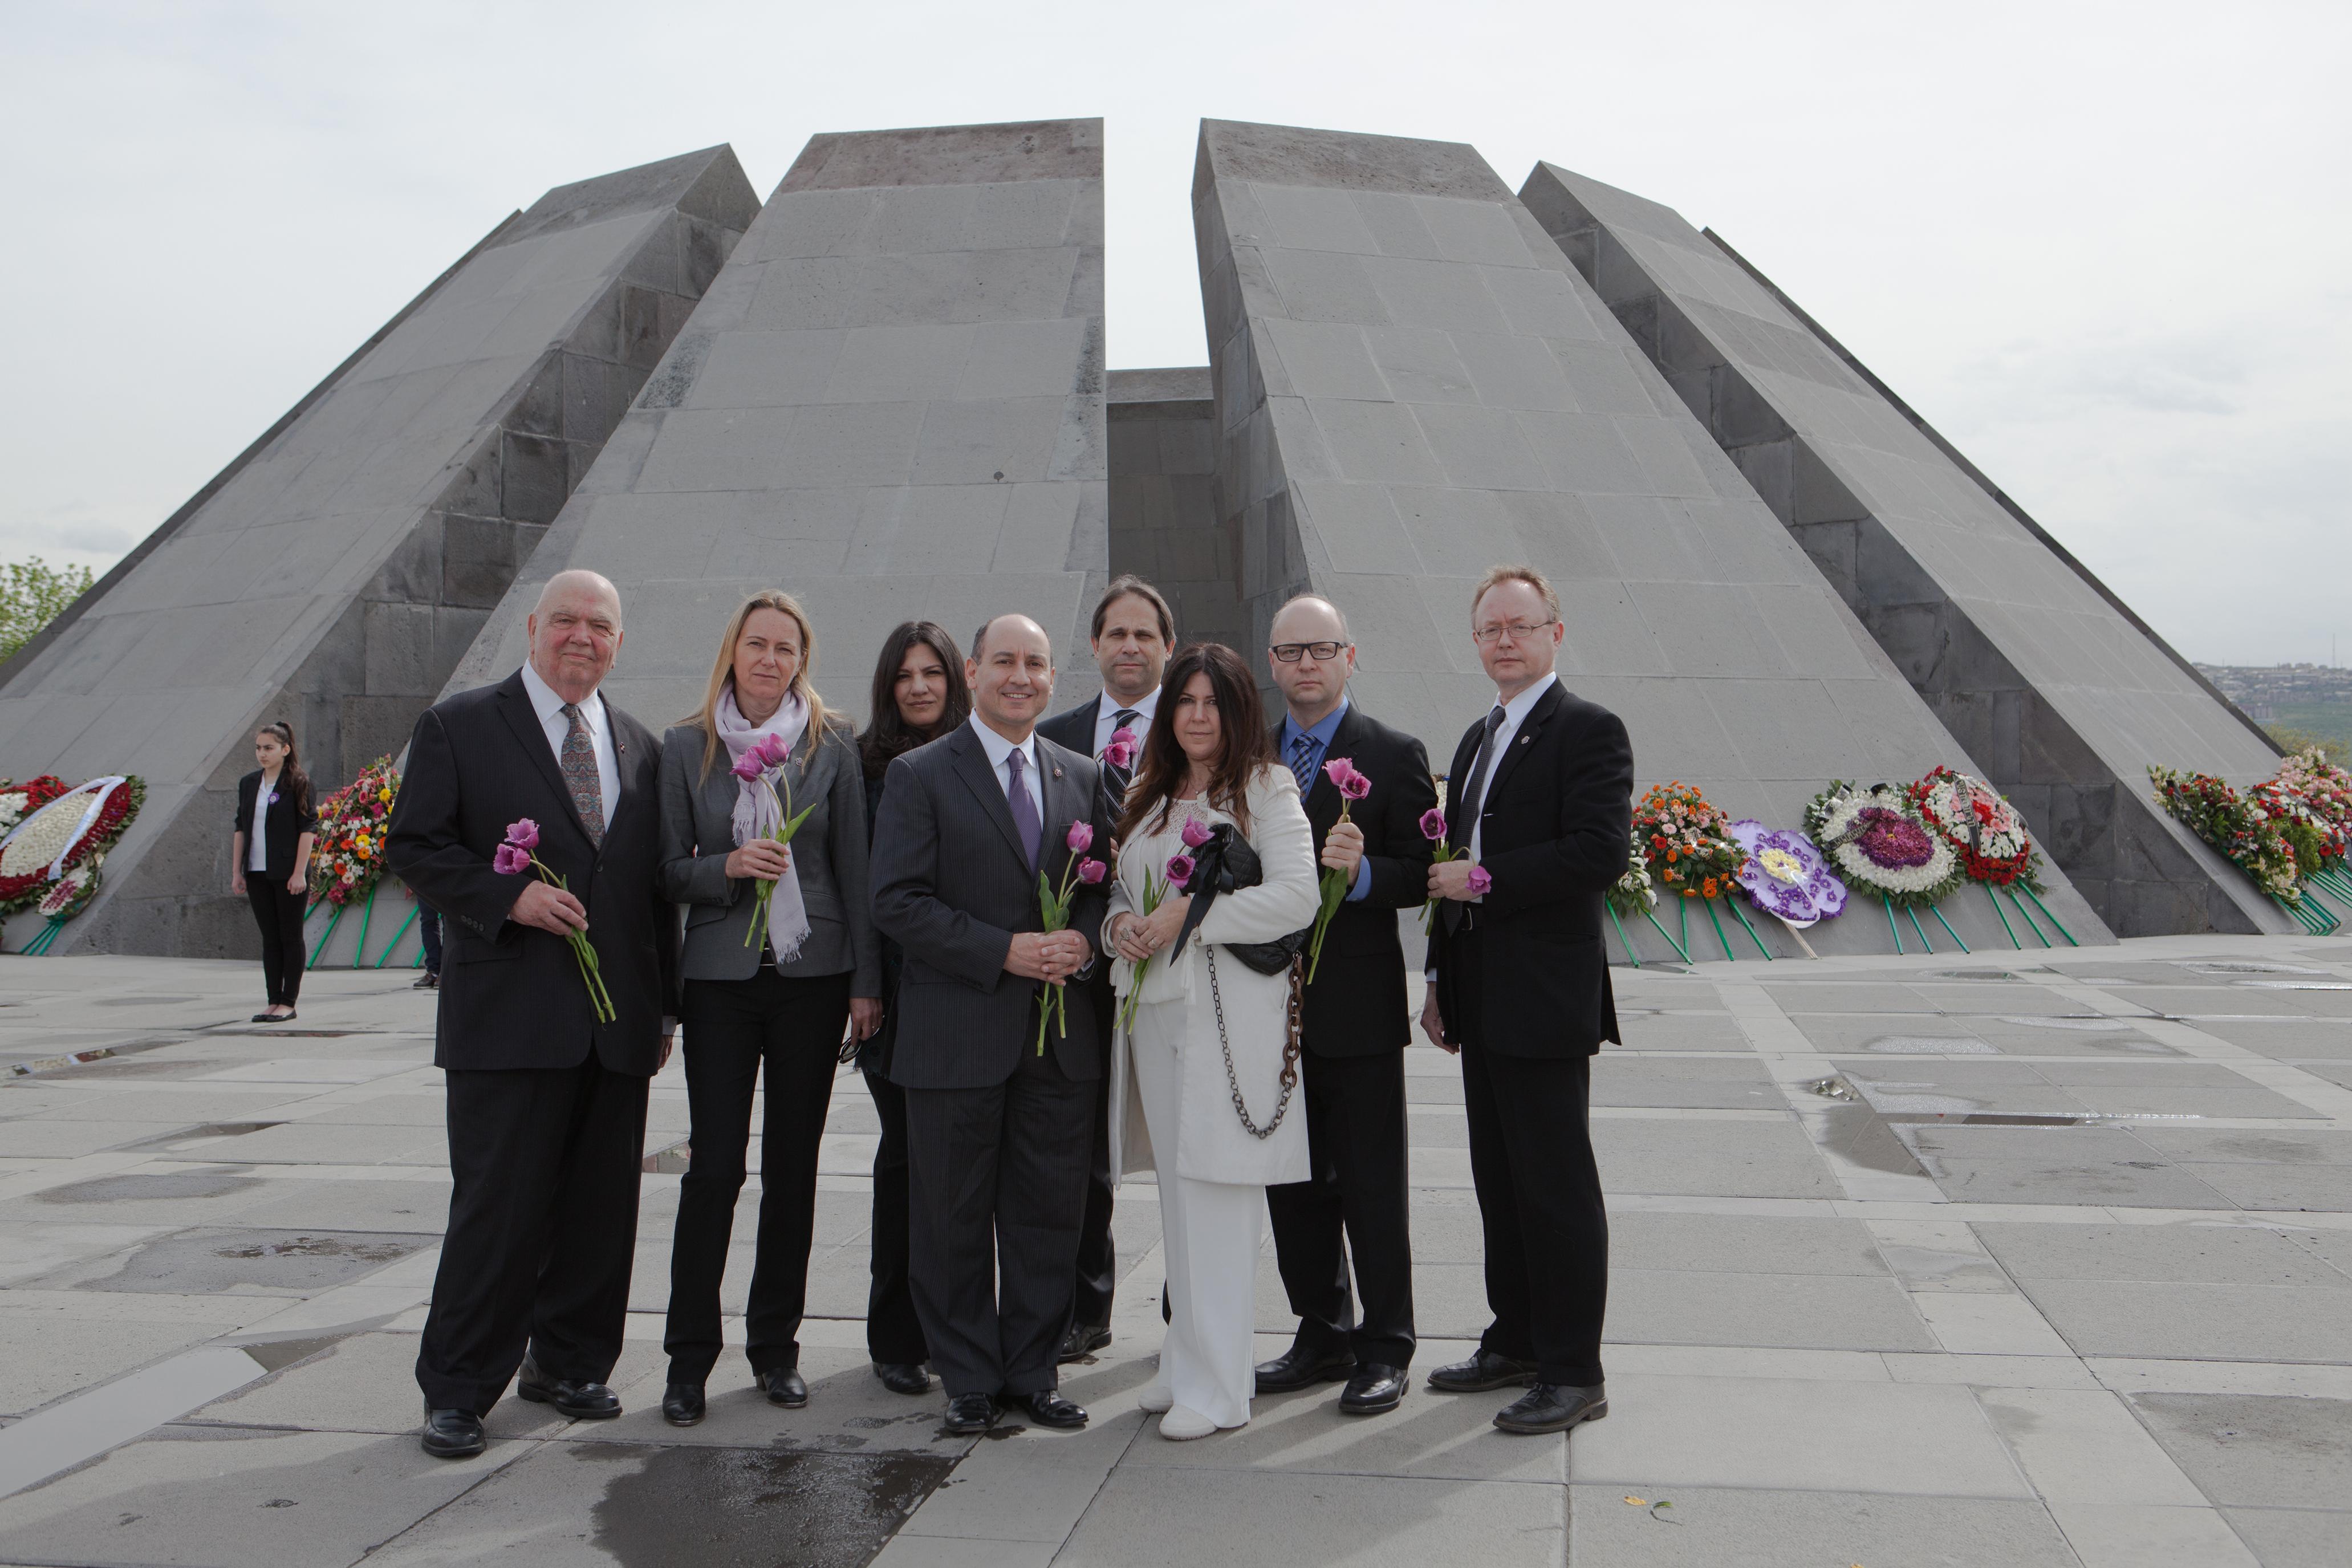 L-R: Richard Hovannisian, Karen Jungblut, Bonnie Zev, Michael Amerian, Ari Zev, Heather Maio, Stephen Smith and Wolf Gruner at the Armenian Genocide Memorial